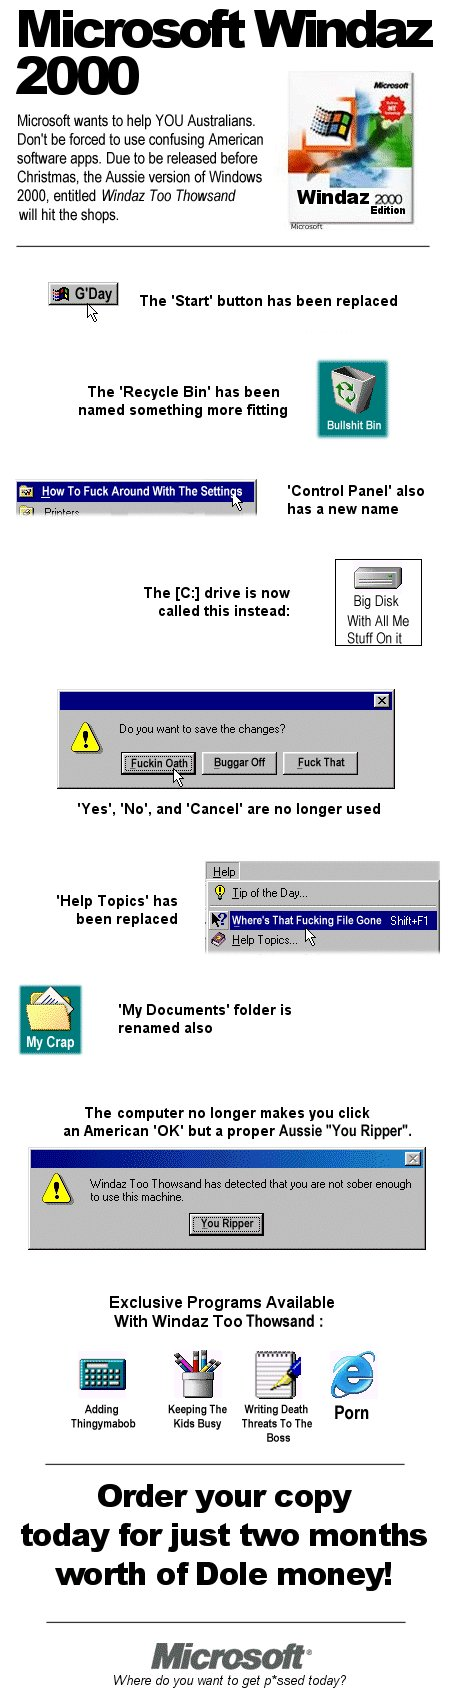 Microsoft Windaz 2000